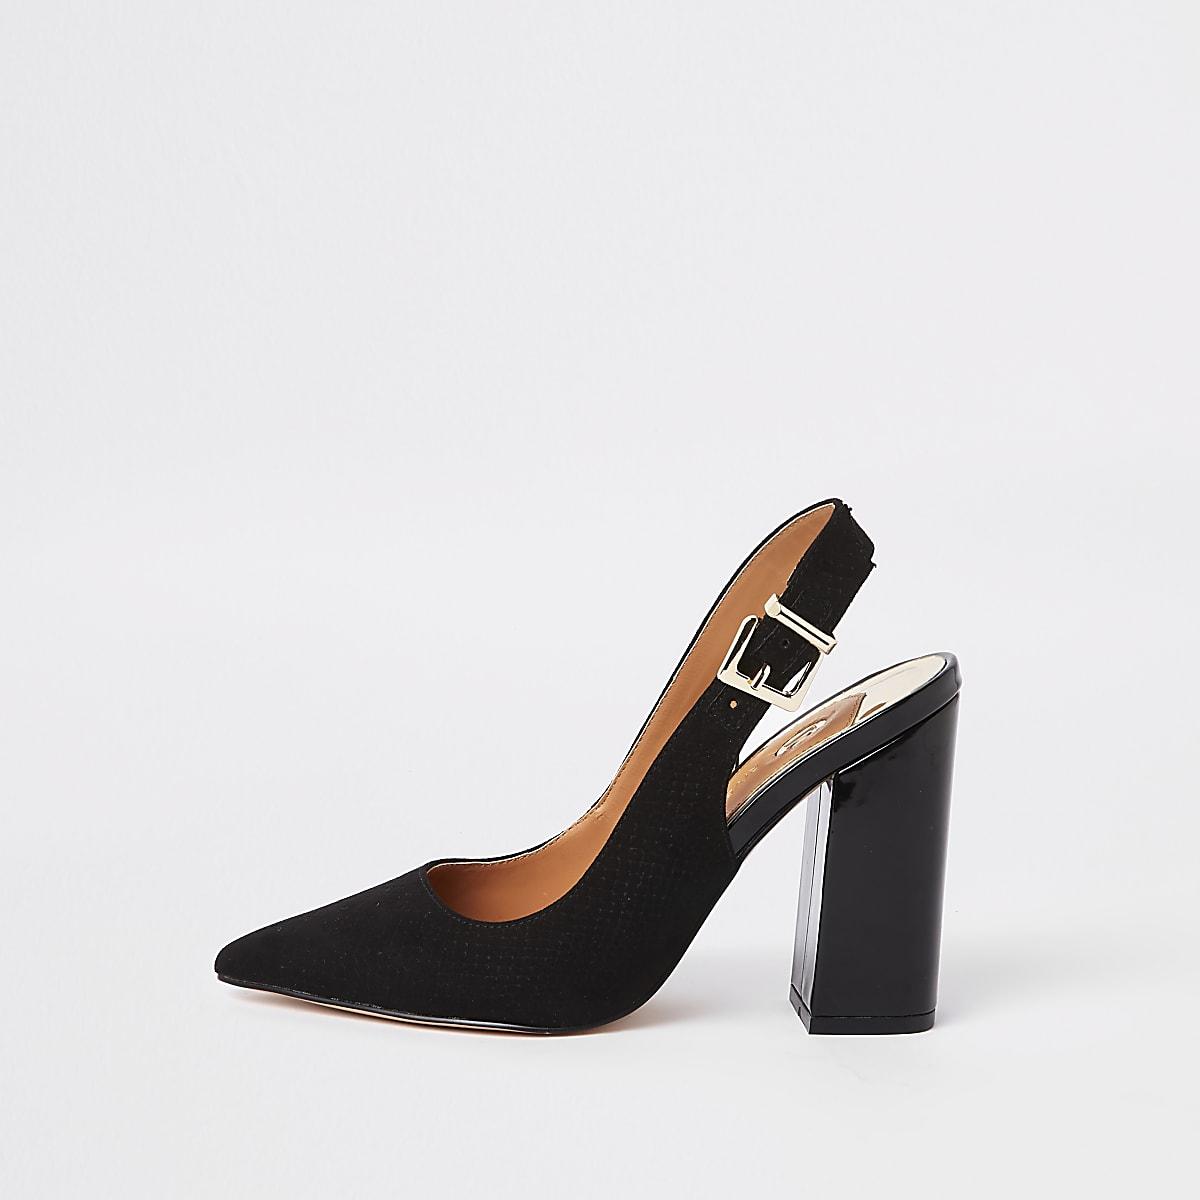 365f2f3180f Black block heel slingback court shoes